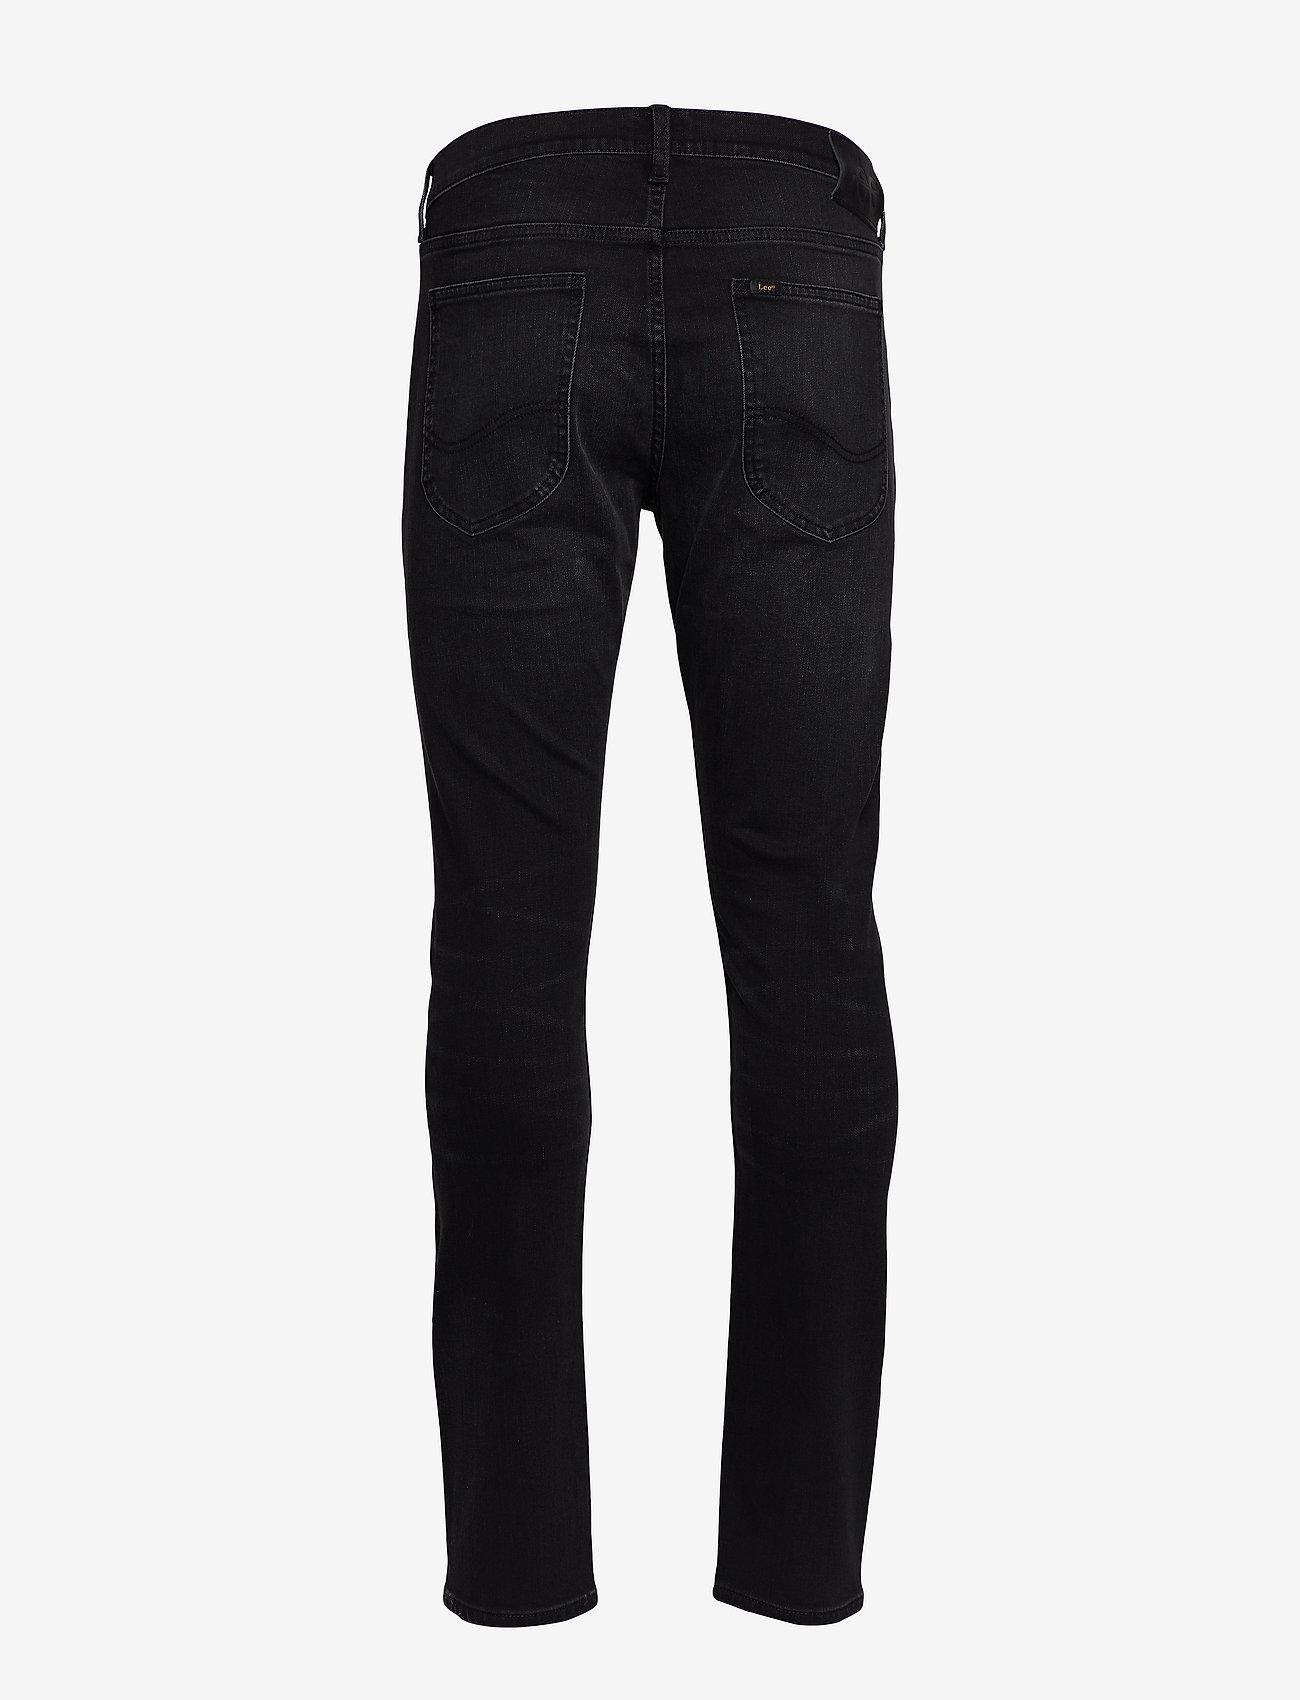 Lee Jeans - Luke - tapered jeans - moto black - 1